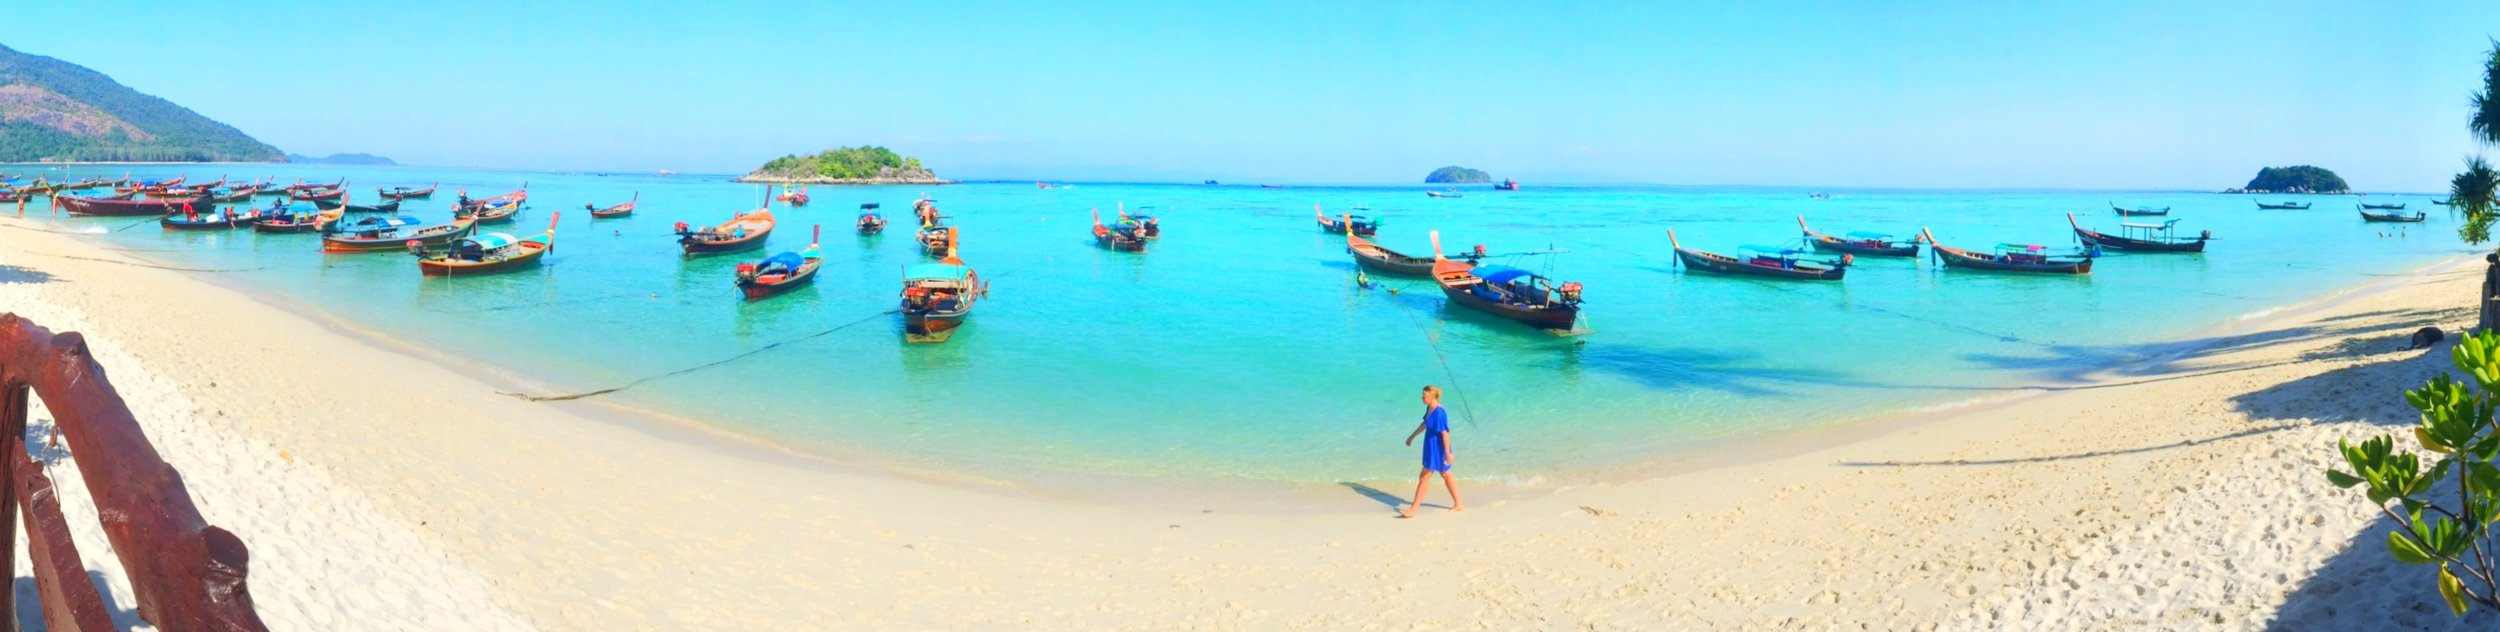 Sunrise Beach, Koh Lipe Thailand. Thailand's most beautiful island.